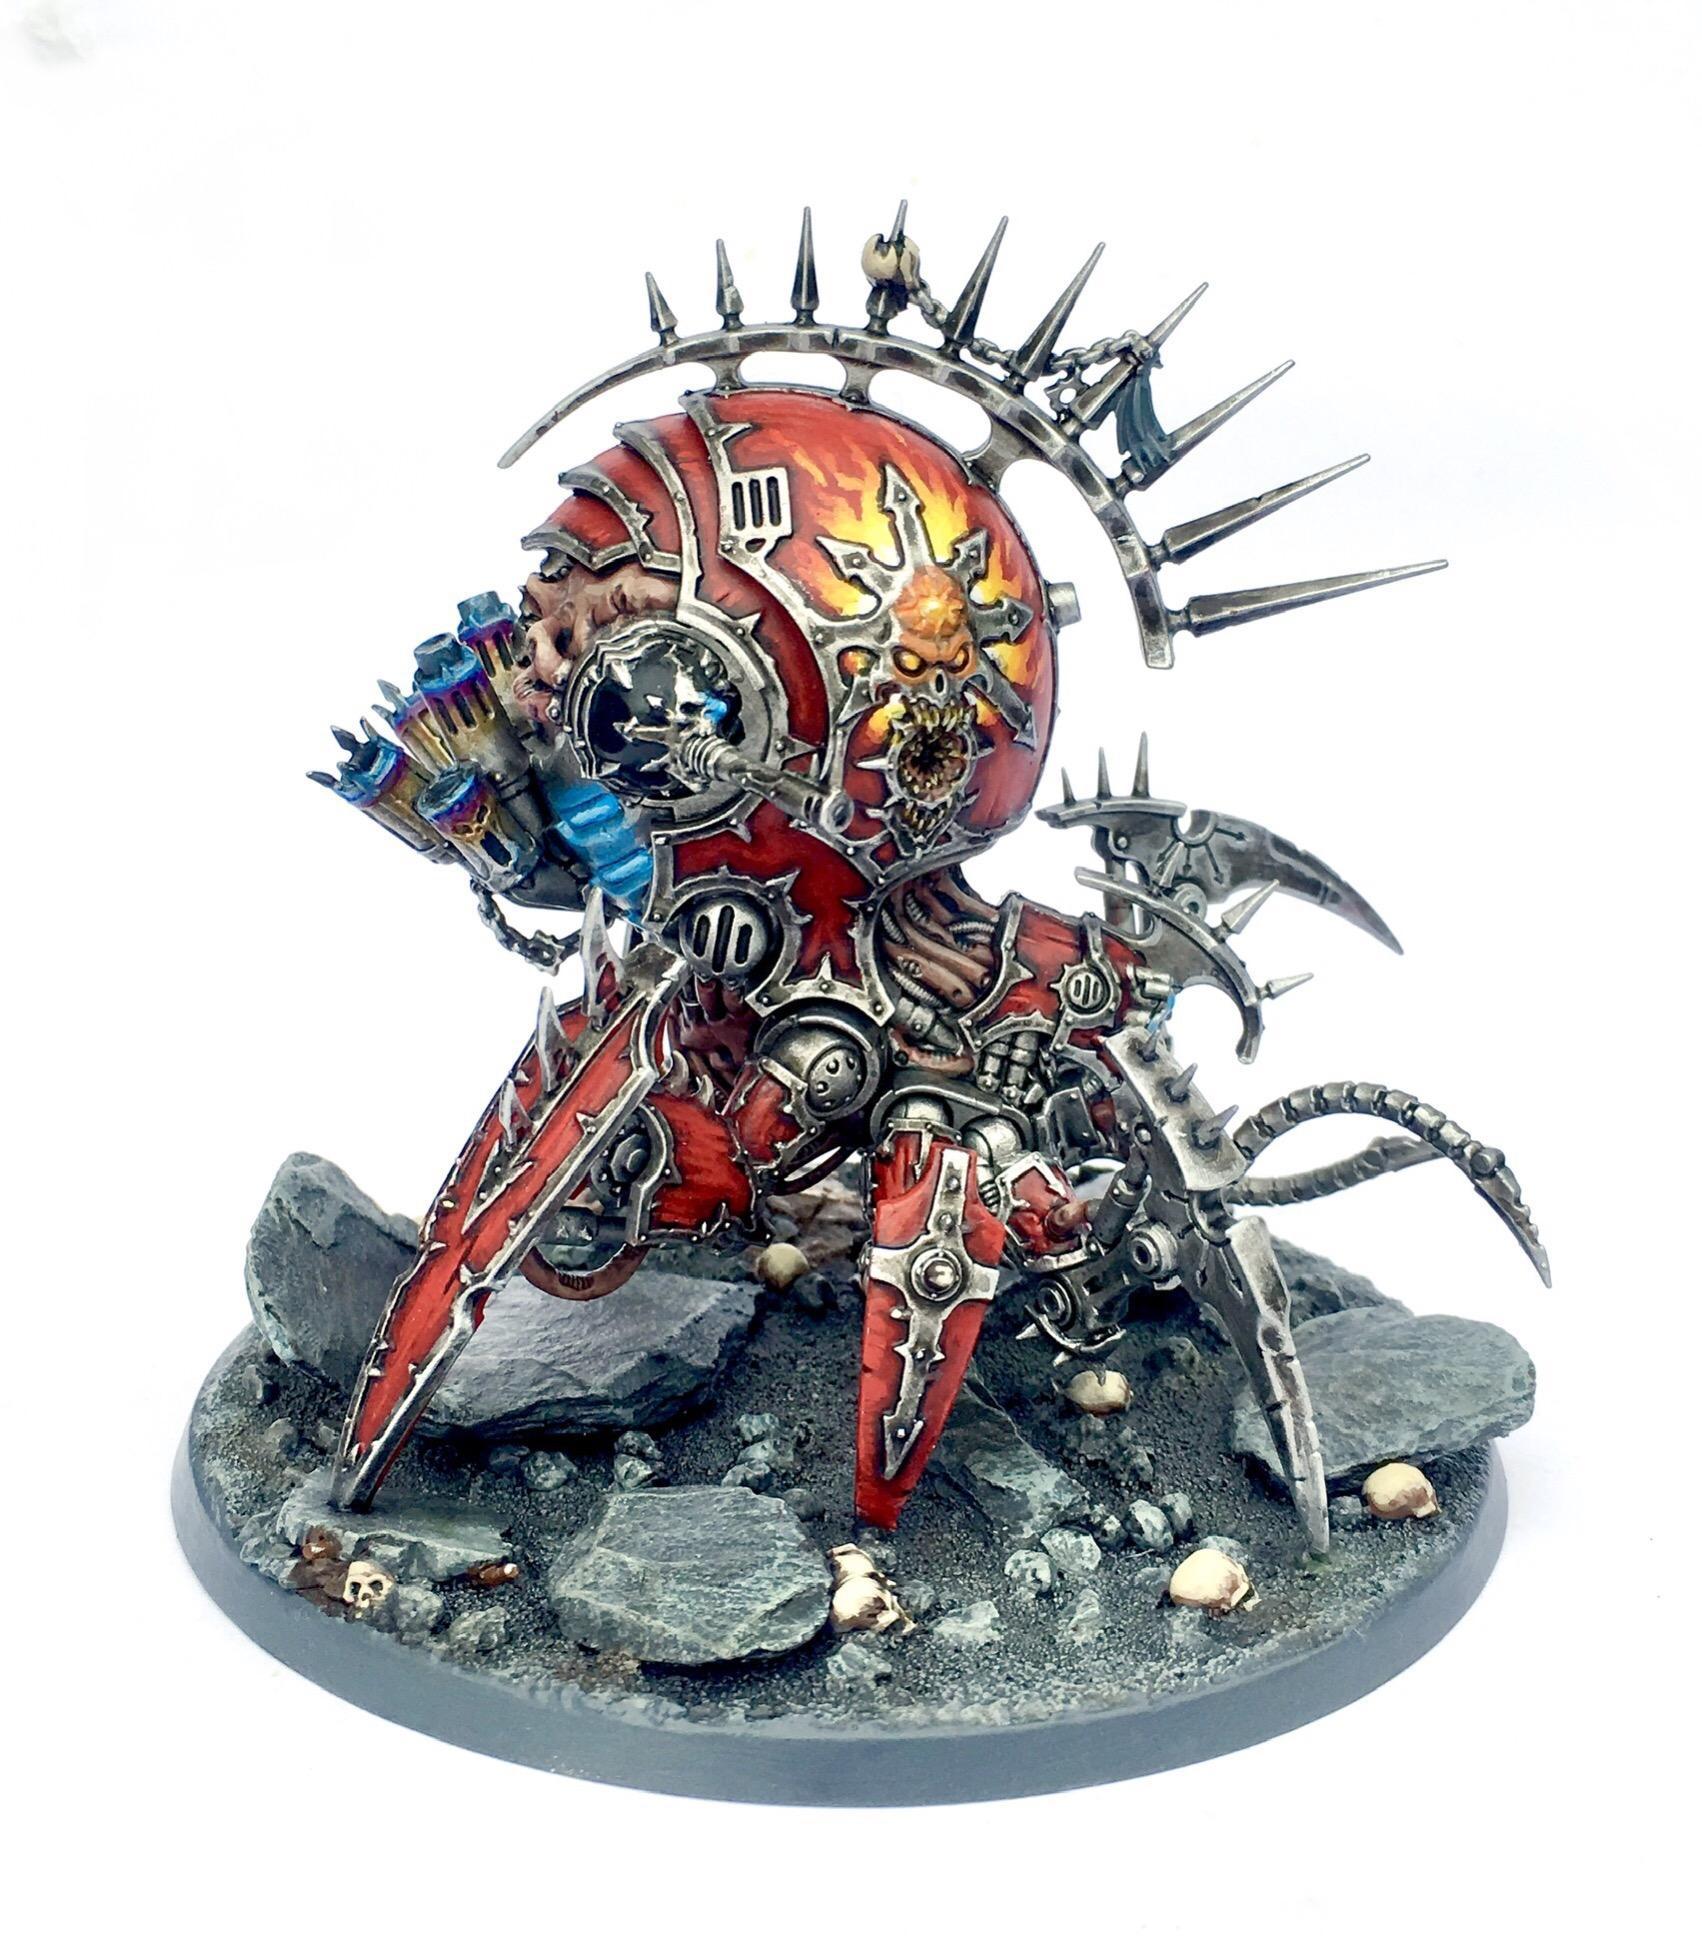 Chaos, Chaos Space Marines, Daemon Engine, Daemons, Heretic Astartes, Horus Was Right, Shadowspear, Venomcrawler, Word Bearers